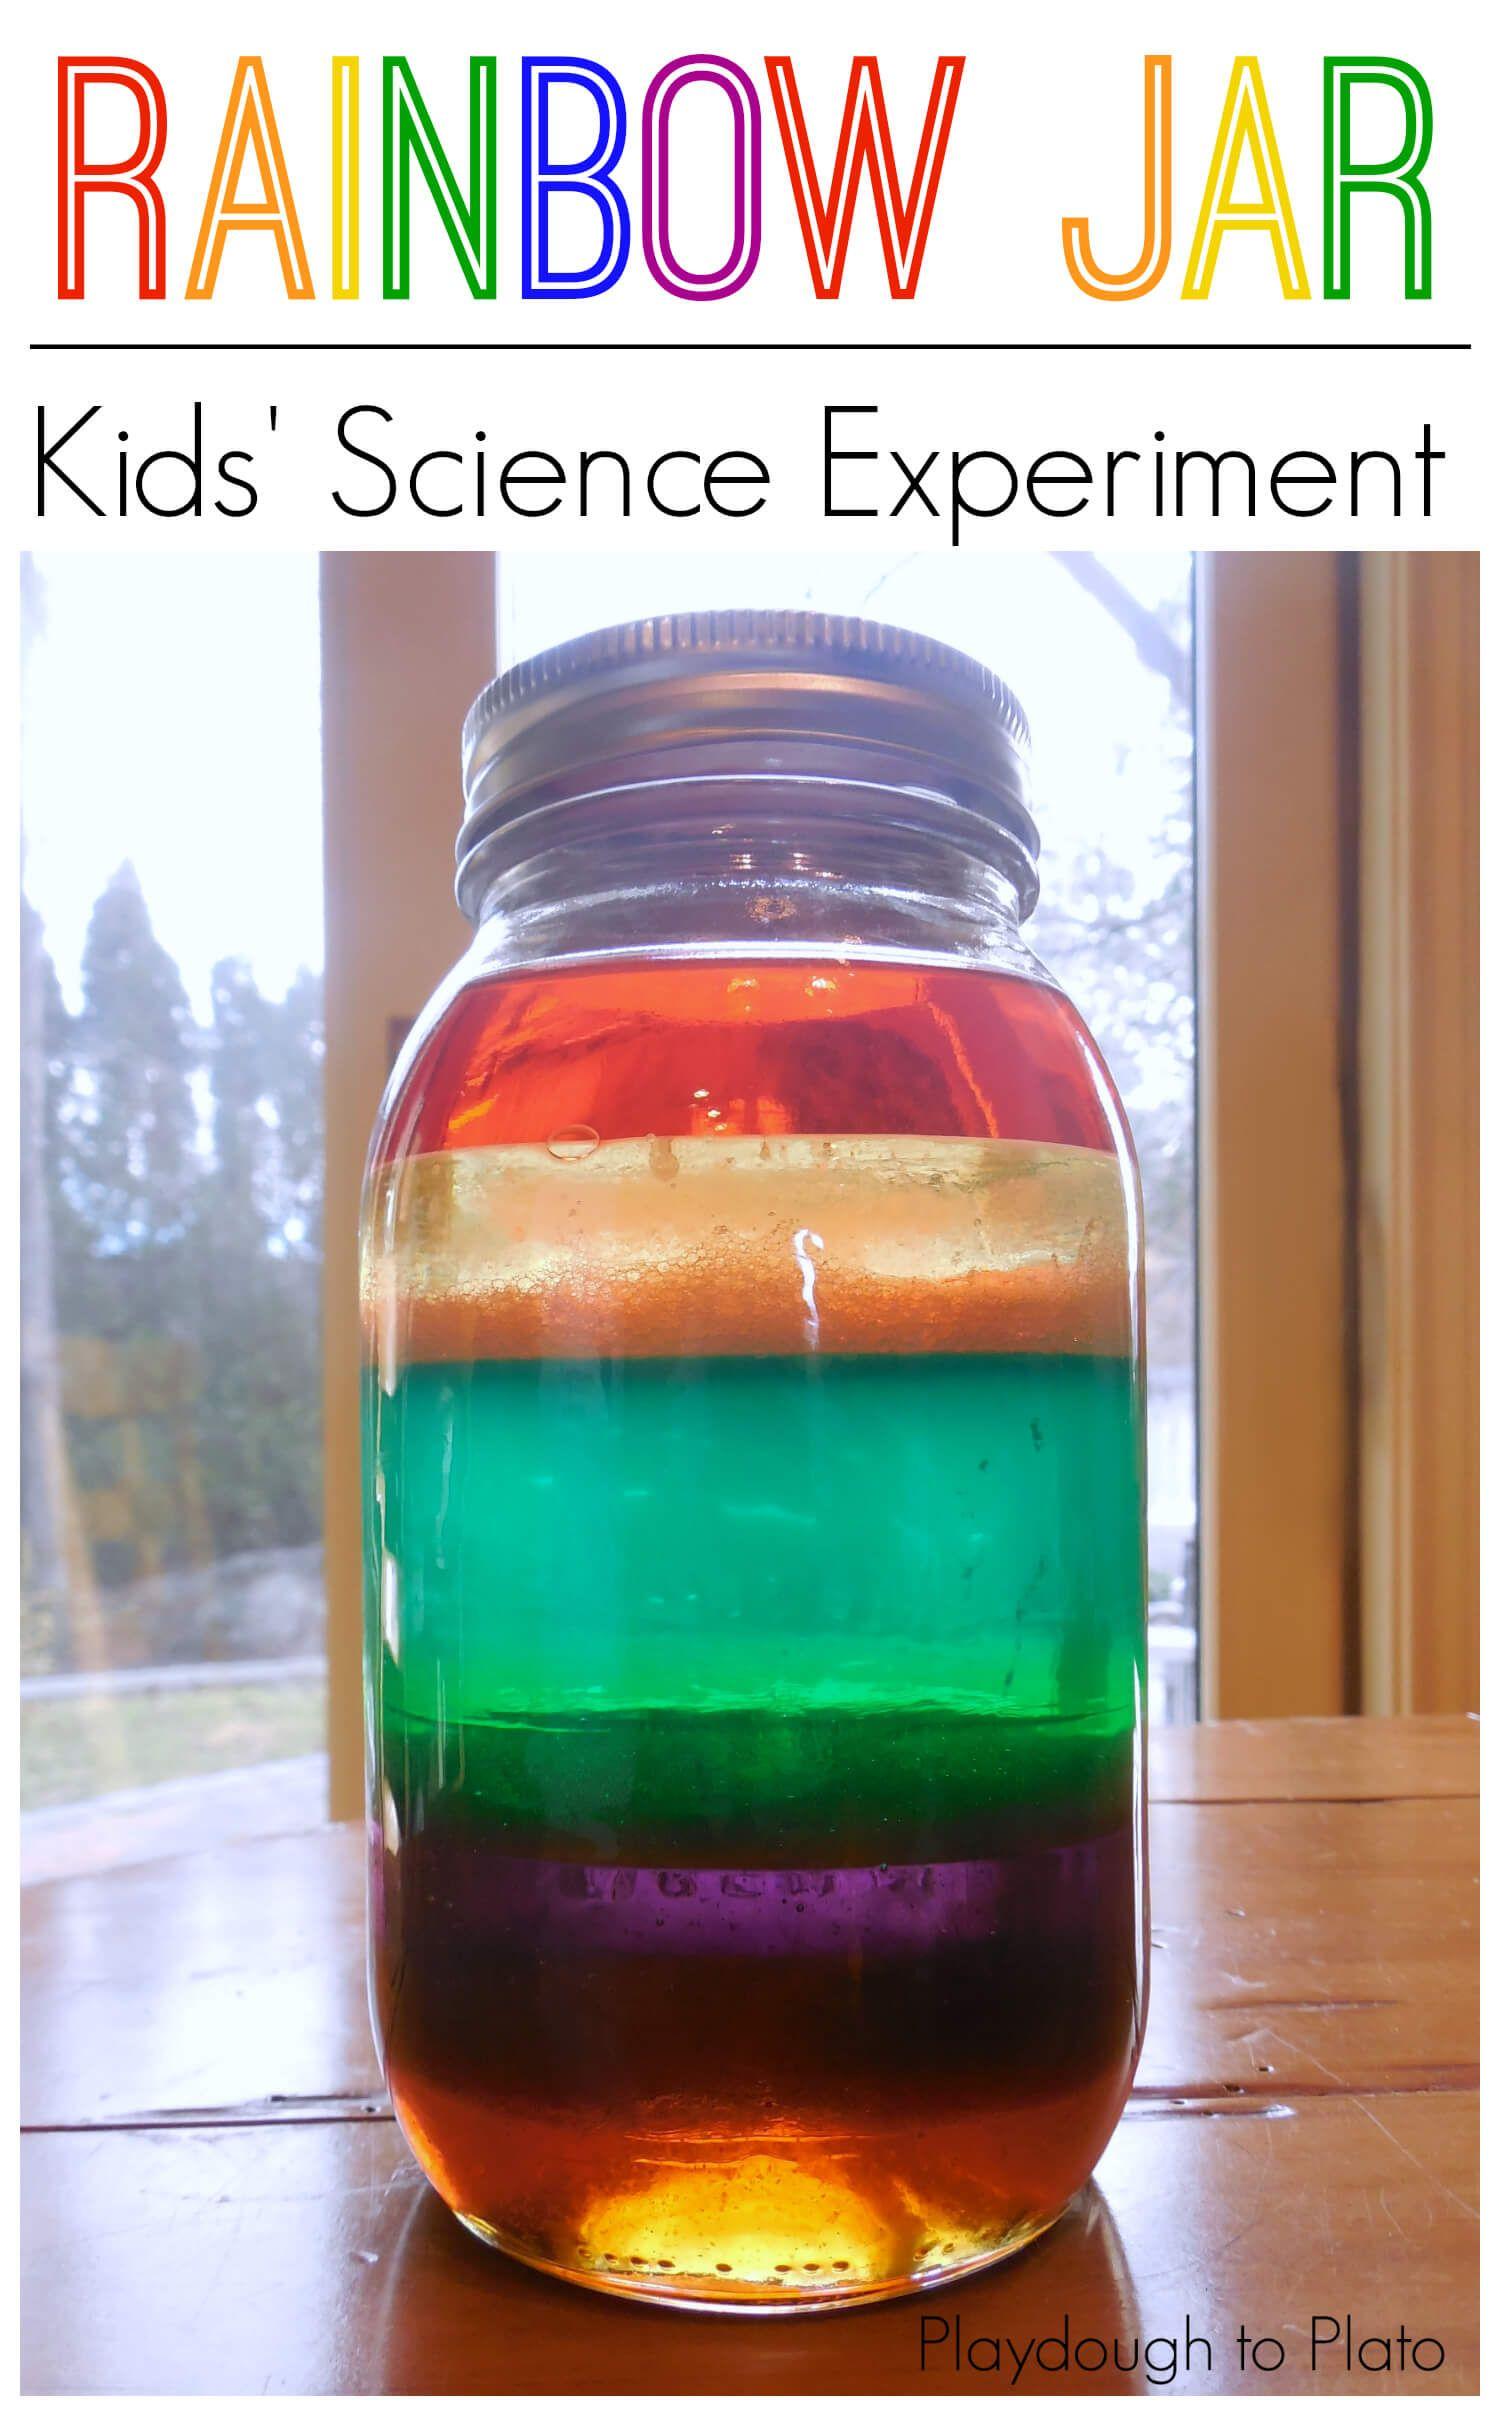 Rainbow Jar Playdough To Plato Science For Kids Preschool Science Science Experiments Kids